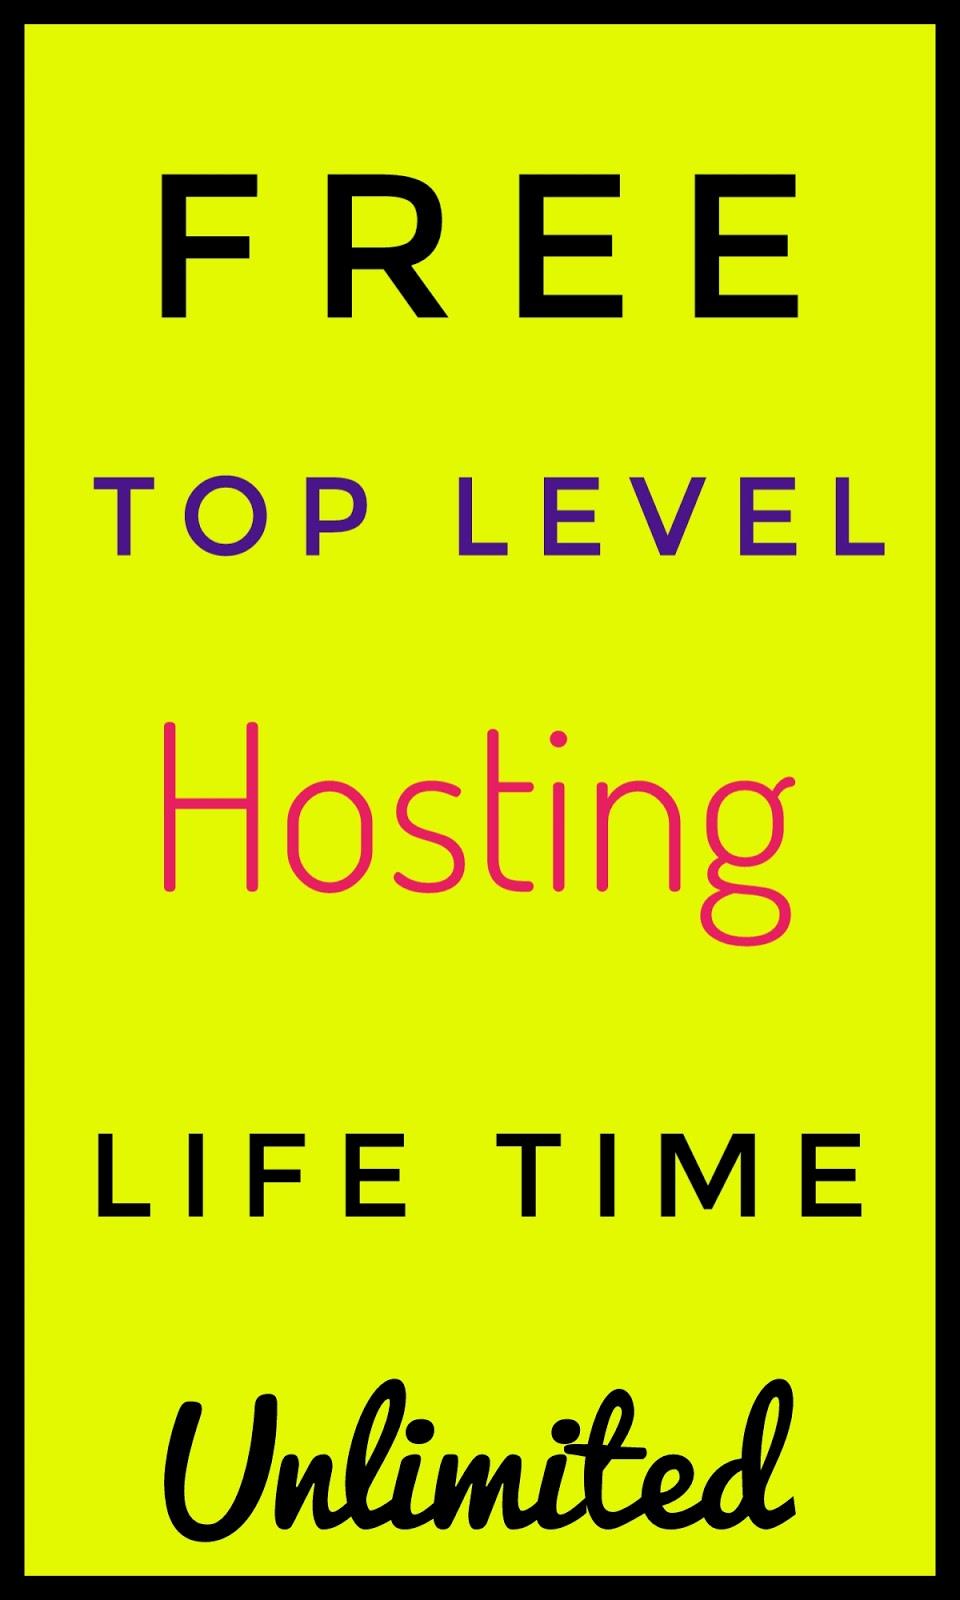 free hosting minecraft server , free hosting website, free website hosting , free hosting for website , free hosting of website, free hosting websites